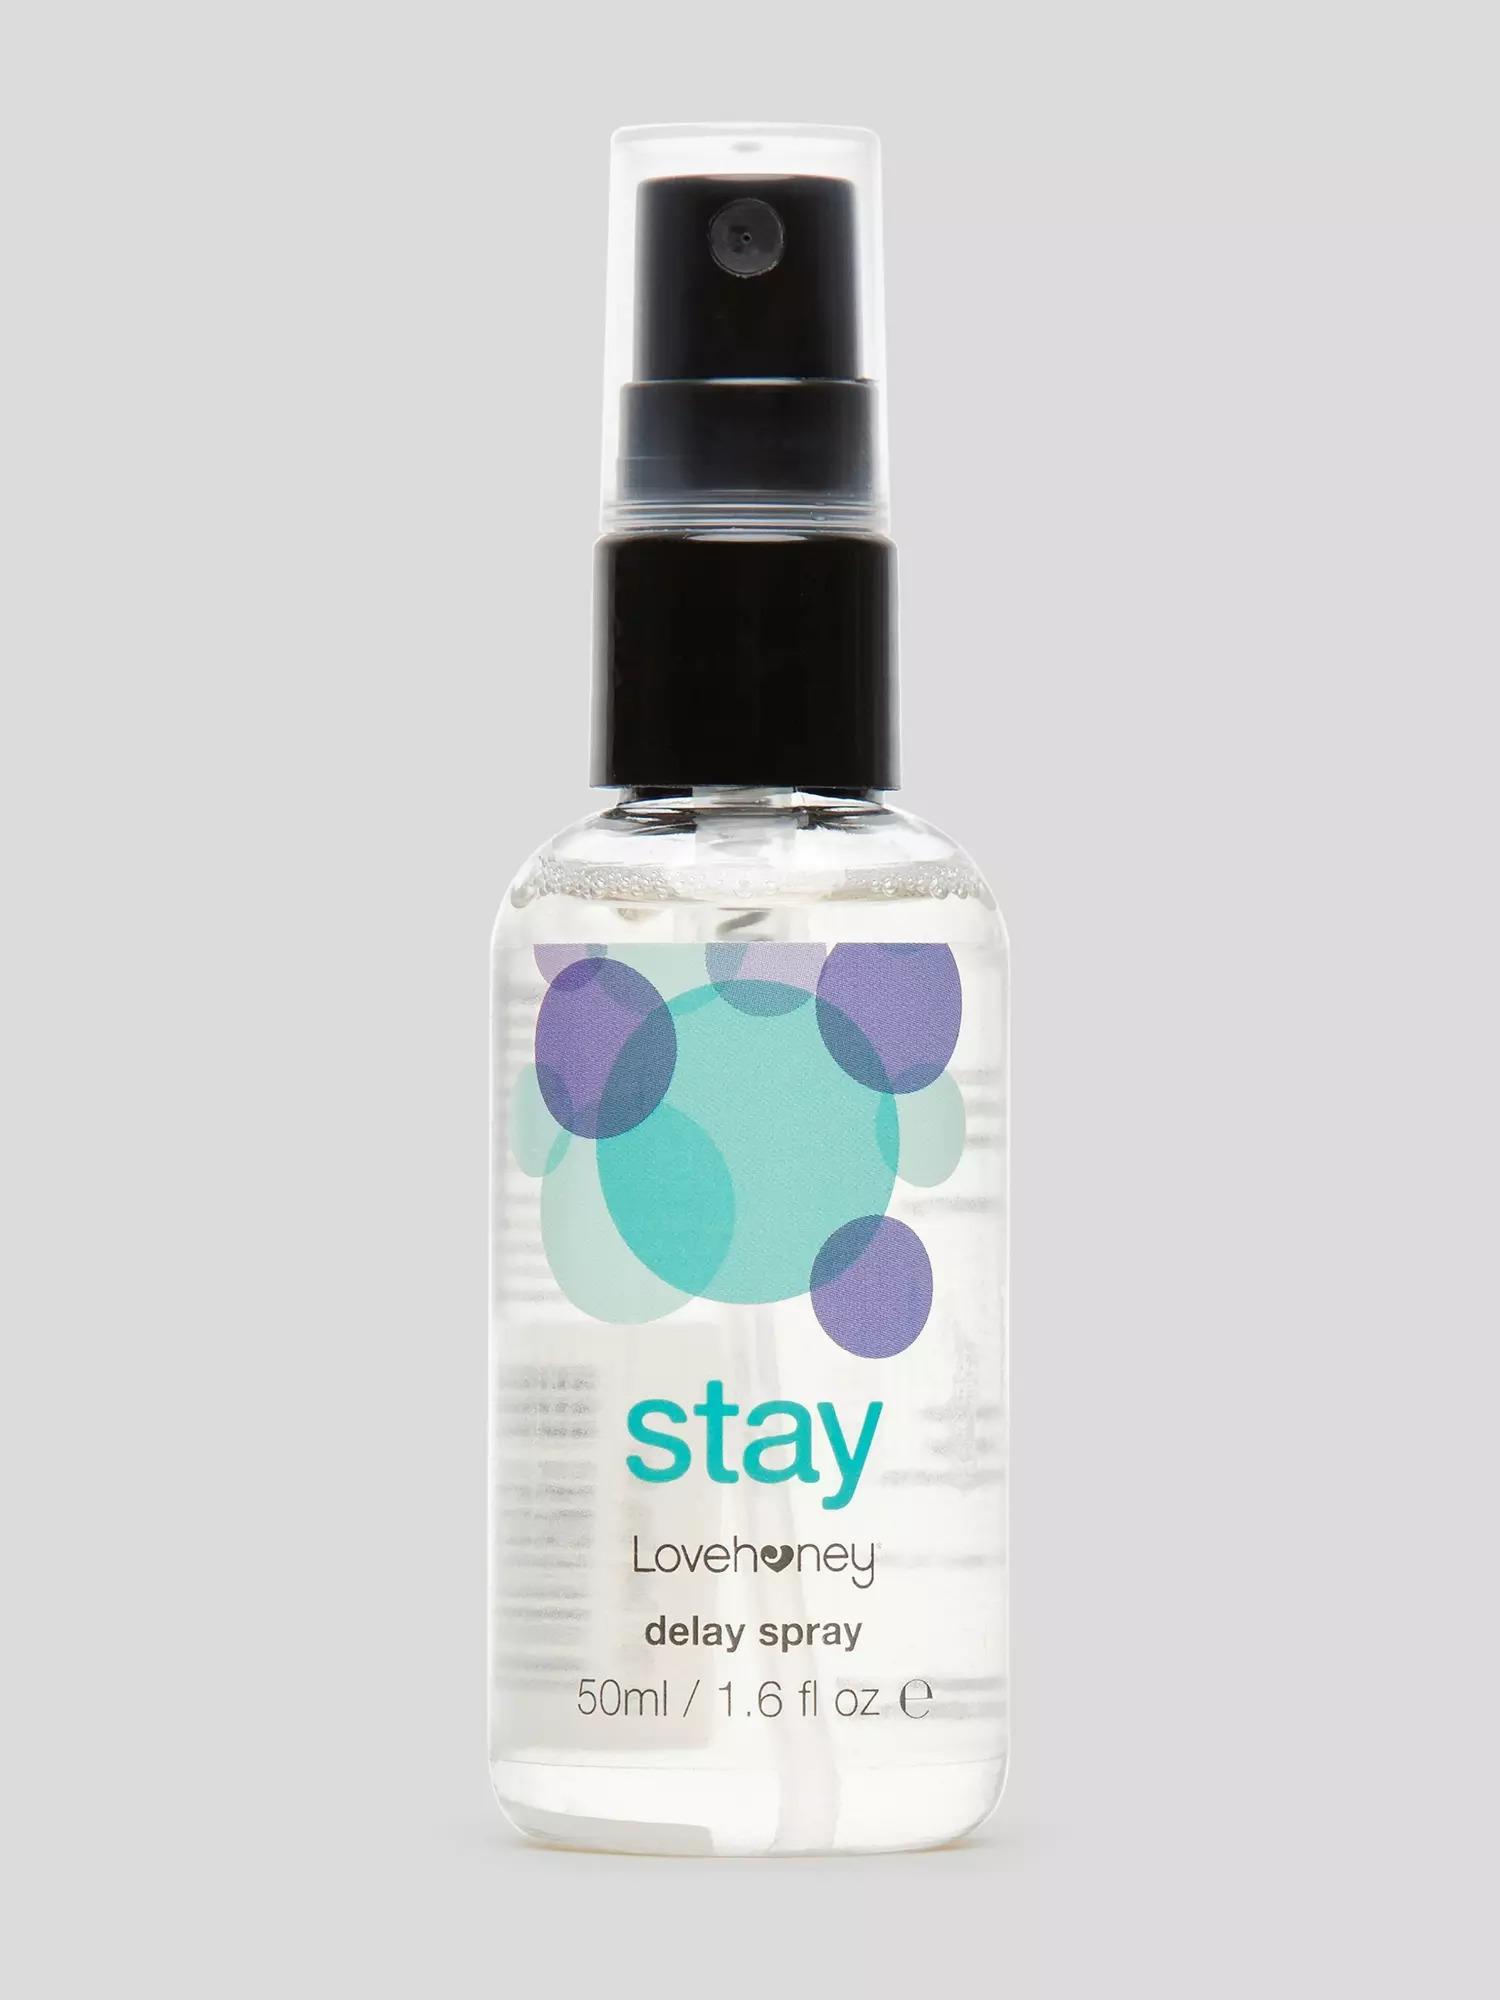 Lovehoney Stay Delay Spray